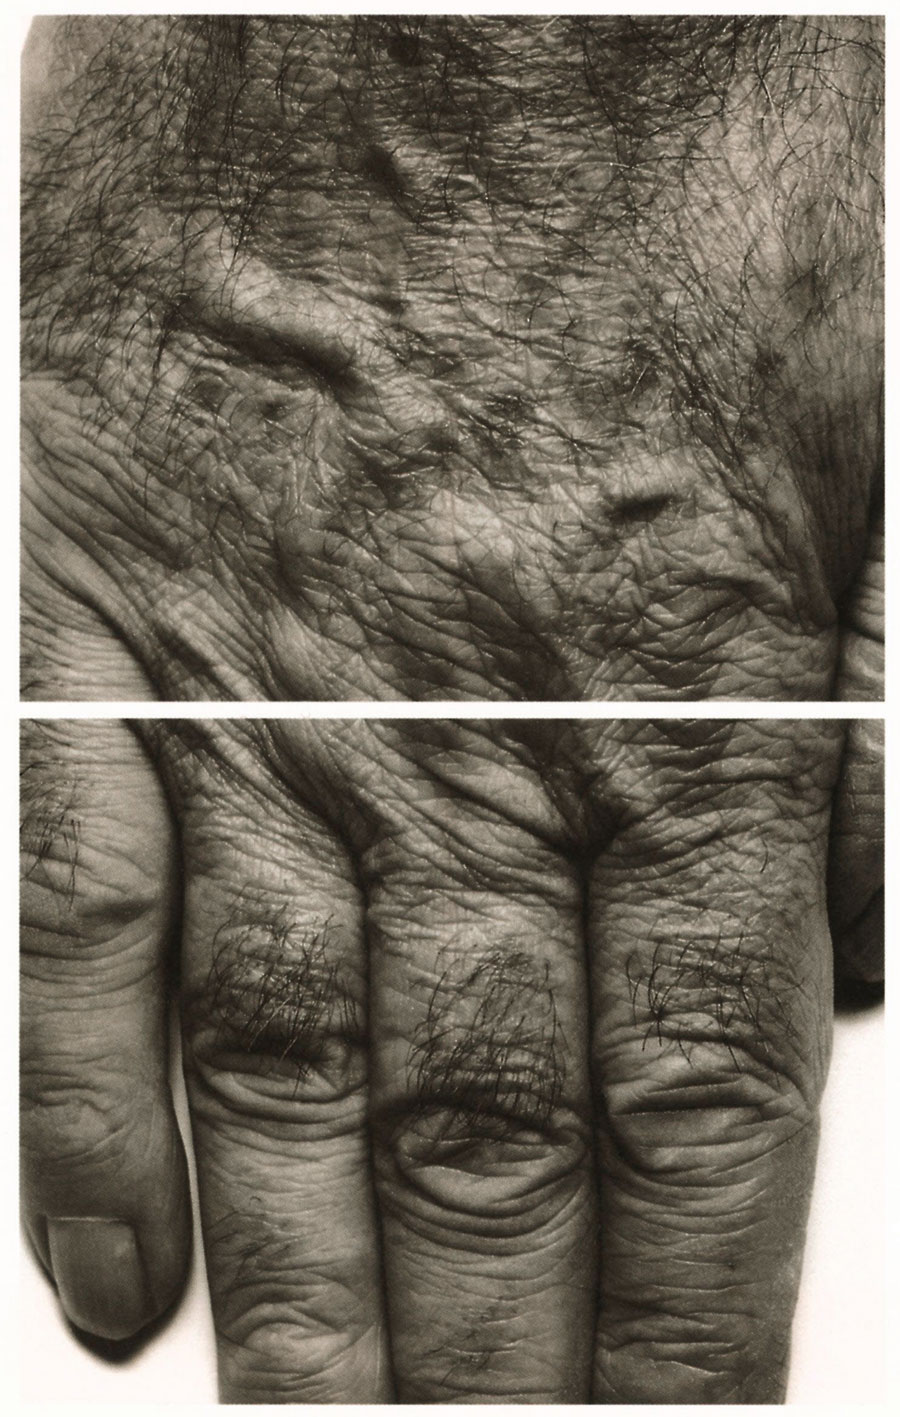 john coplans self portrait interlocking fingers no 17